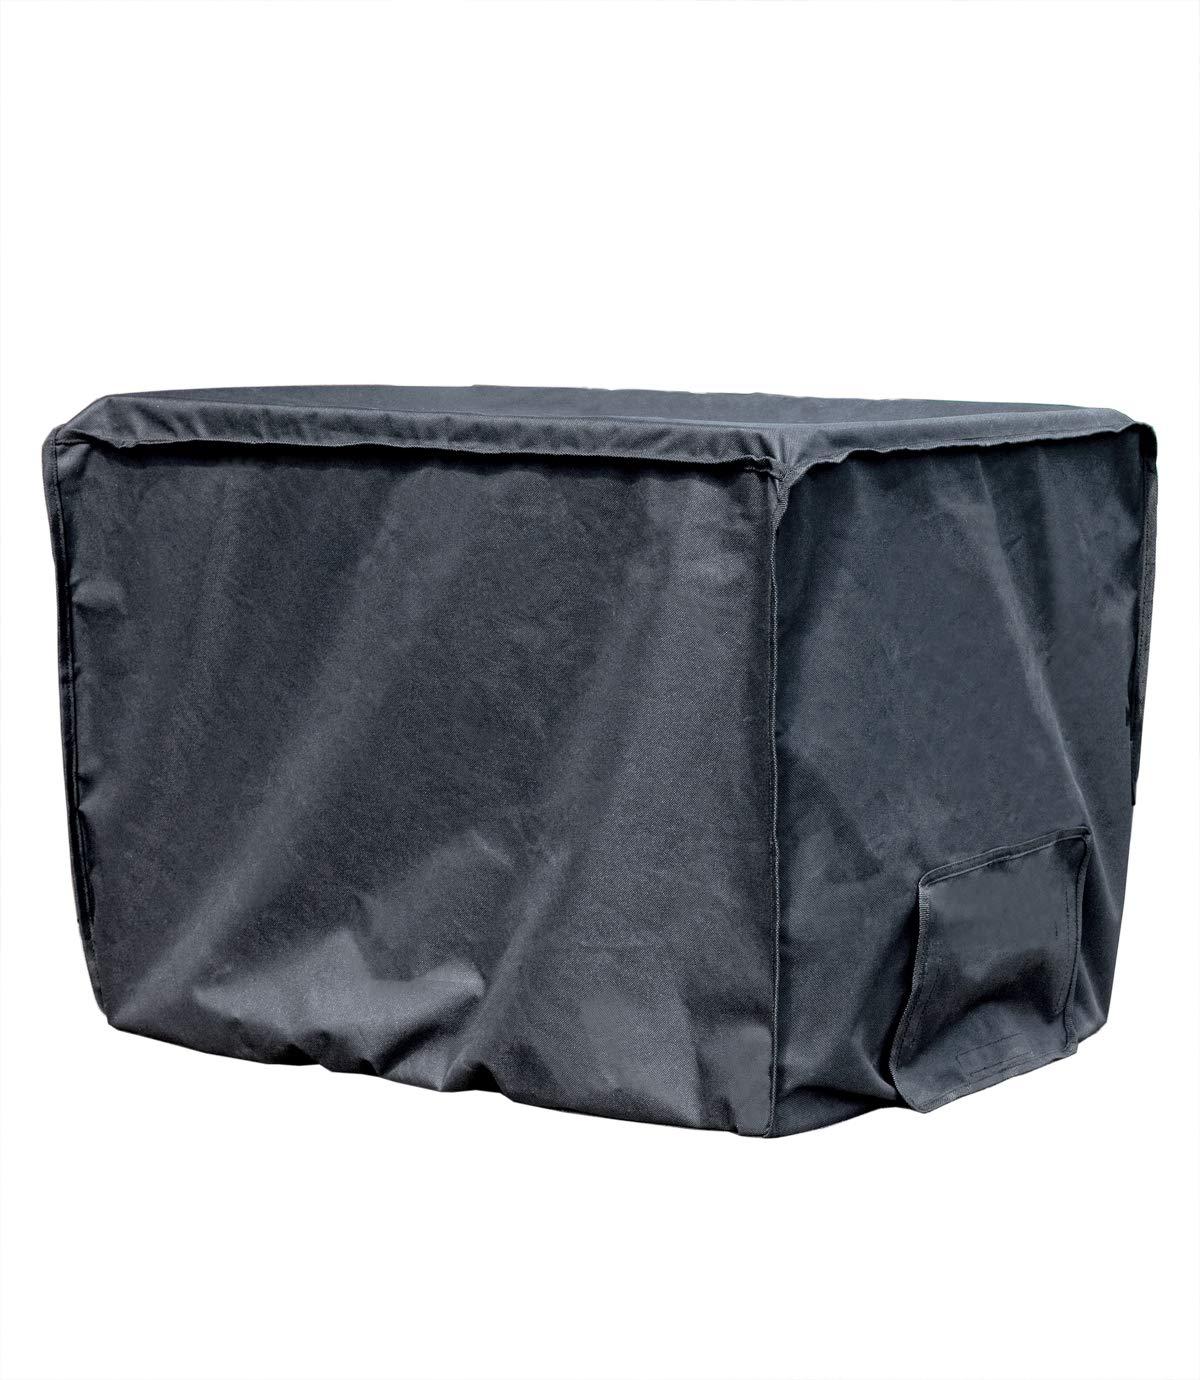 Sturdy Covers Power Generator Defender - Durable, Weatherproof Generator Cover (Small, Black)